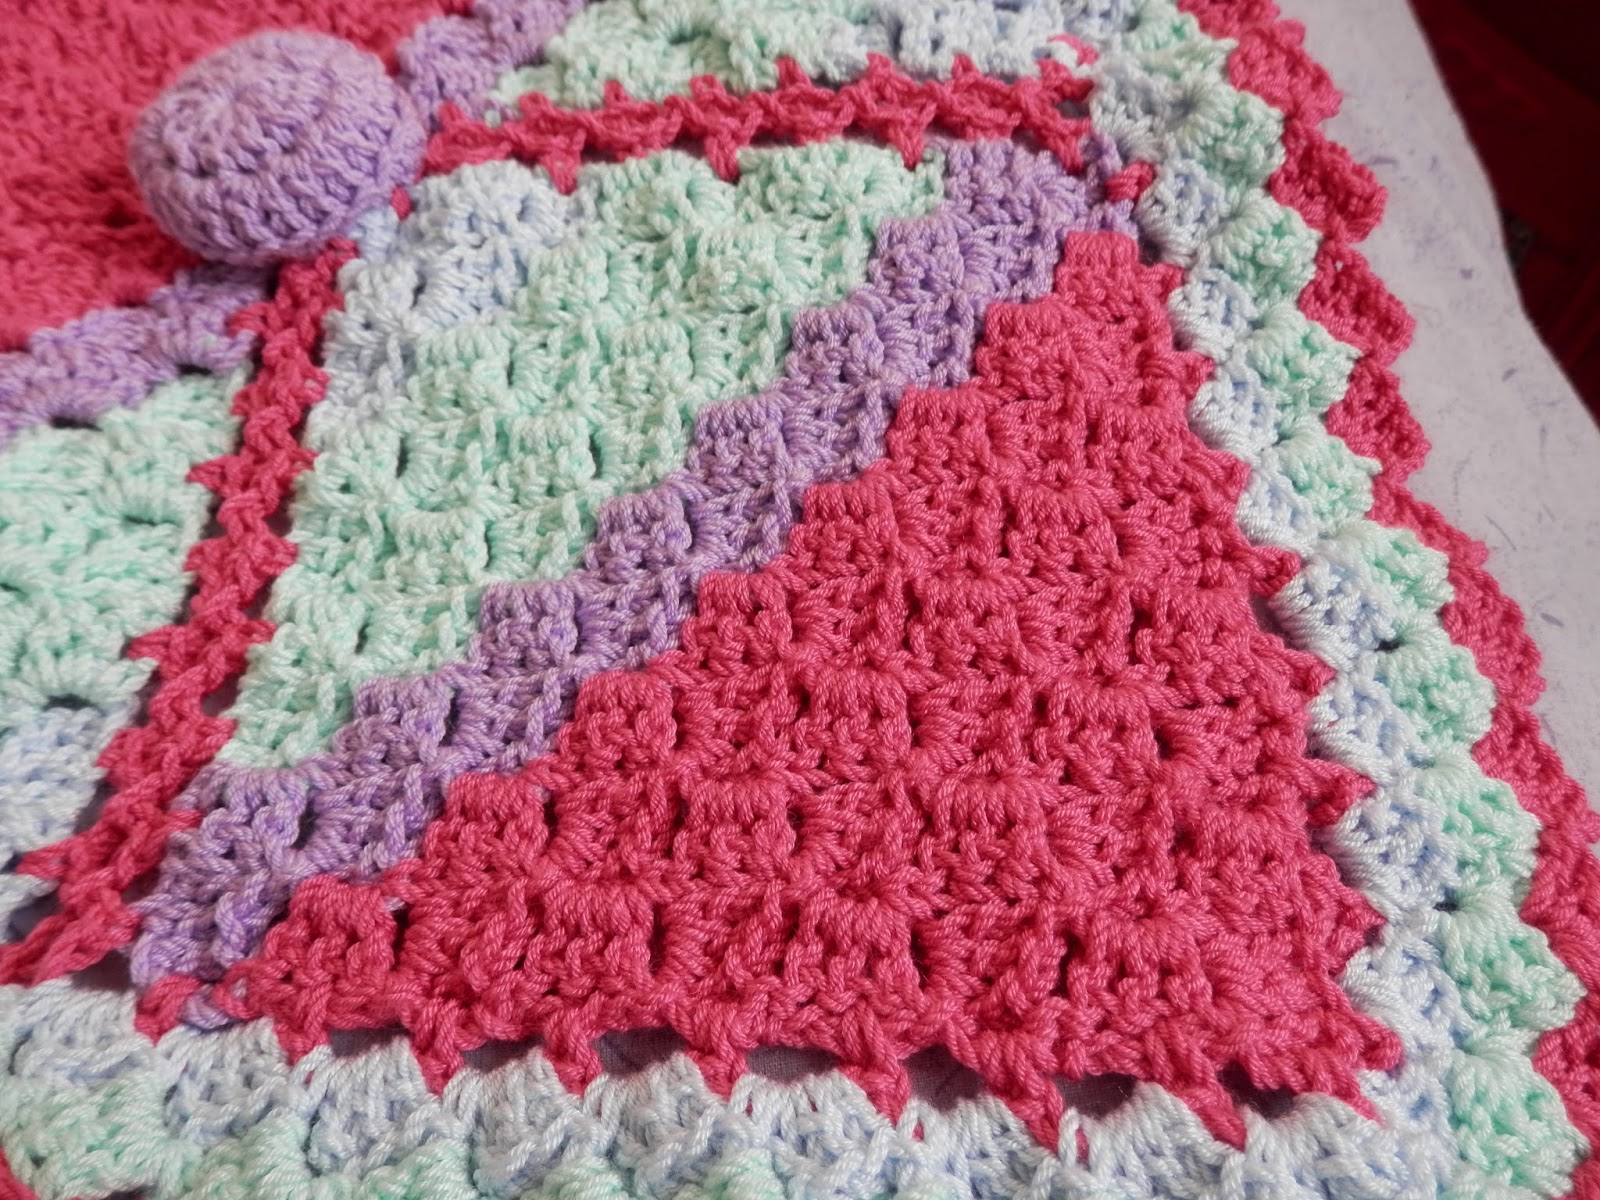 Crocheting C2c : Crochet Chat Corner: C2C Square